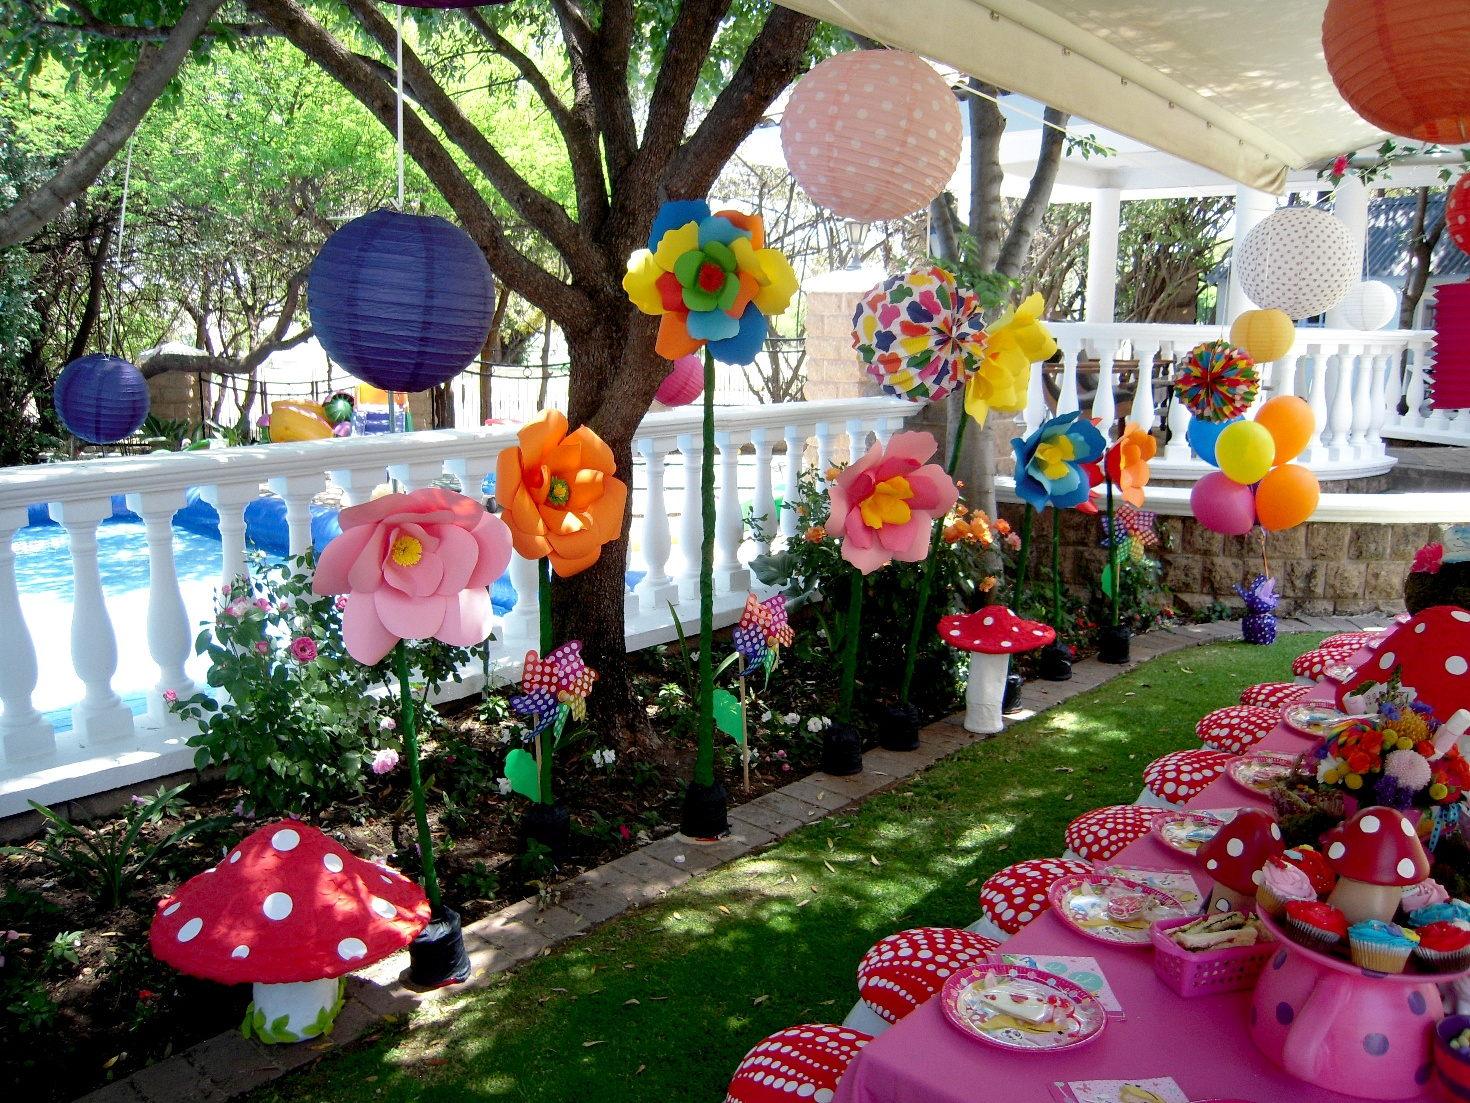 Alice in wonderland hedgehog lane themed party decor for Alice in wonderland decoration